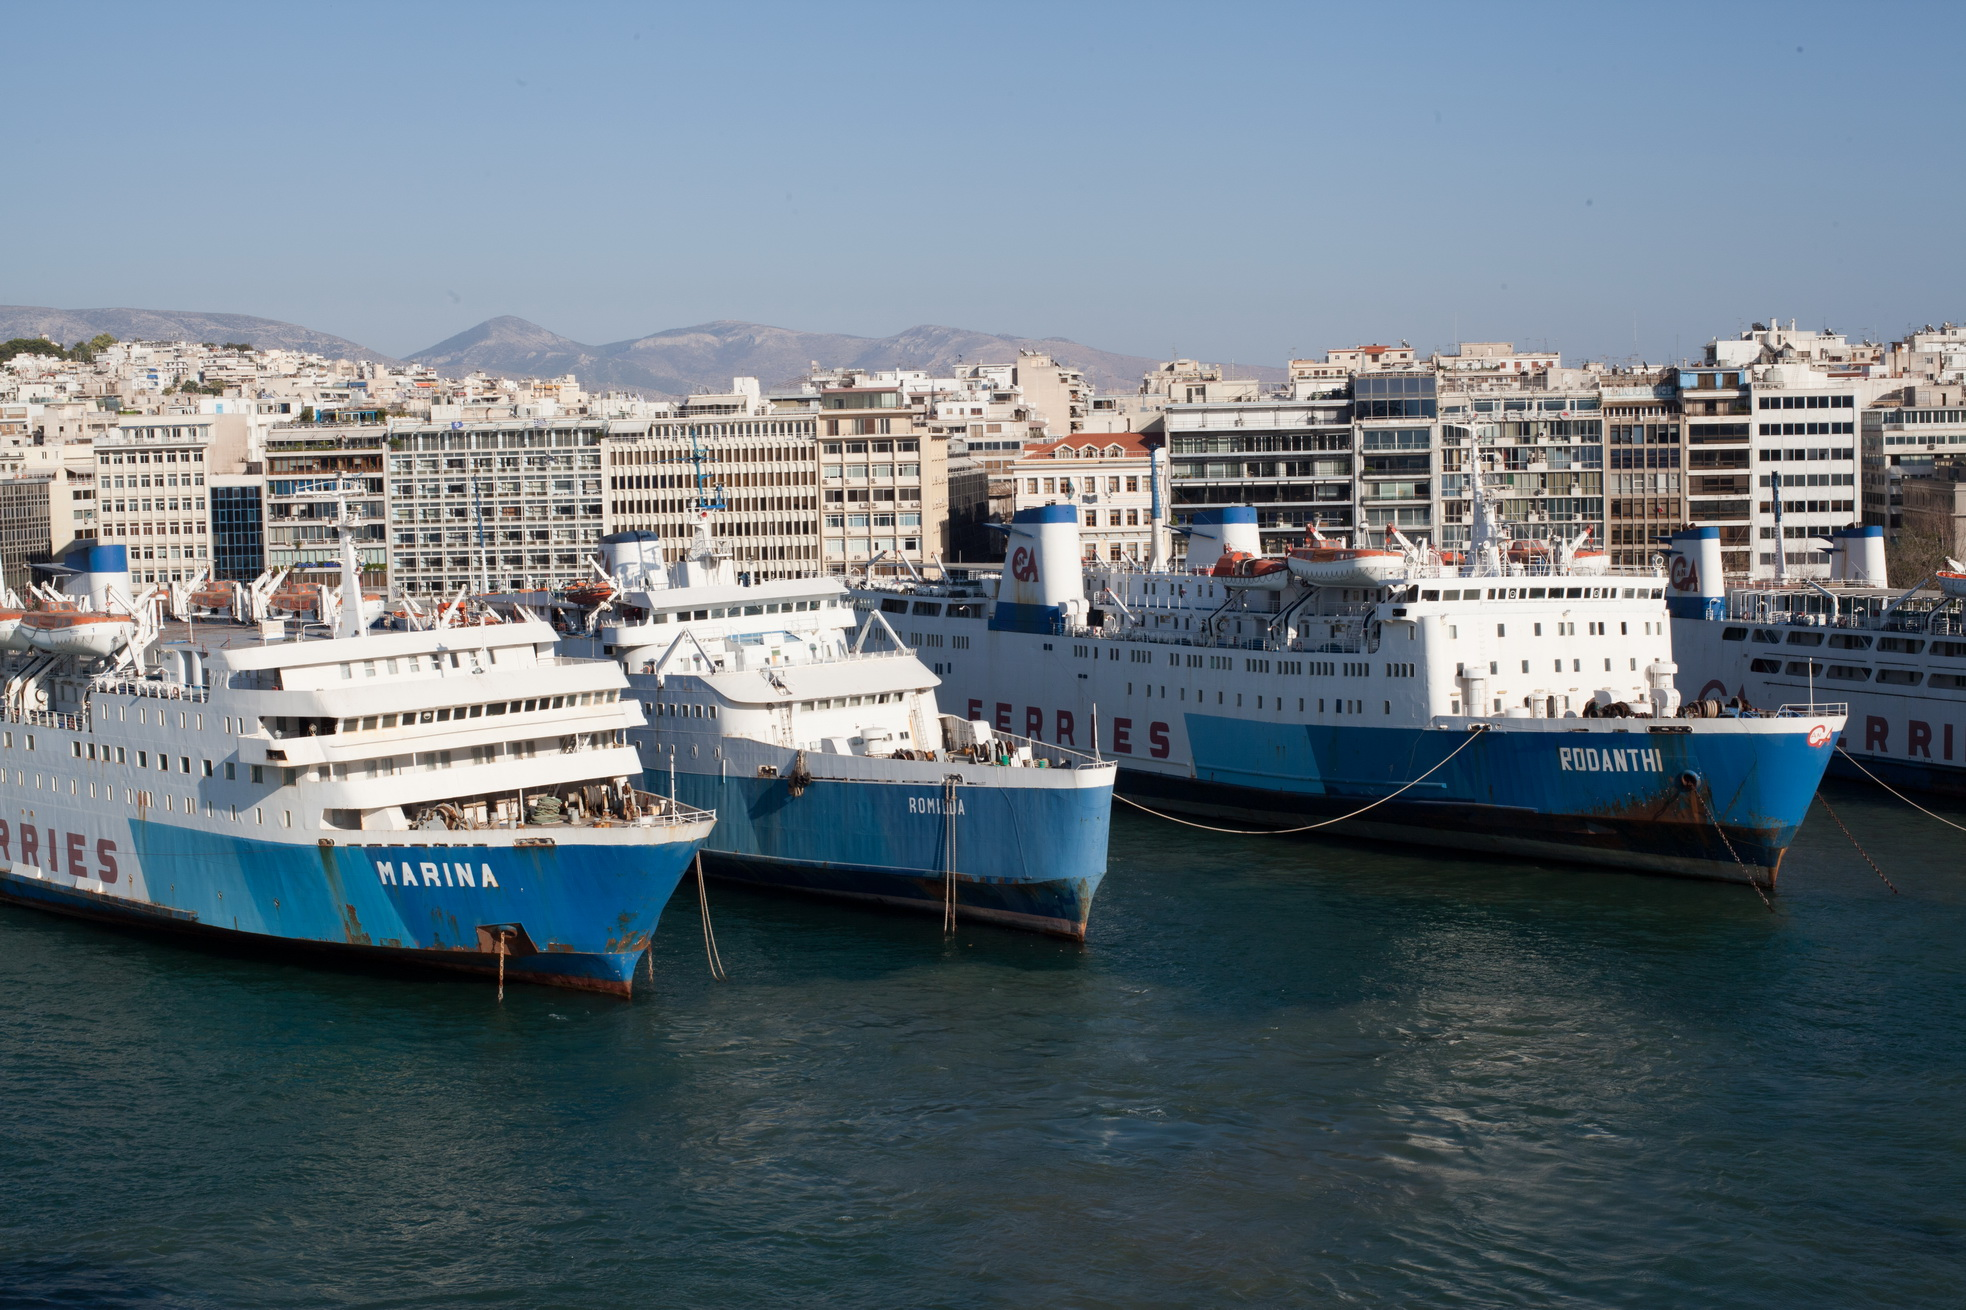 MS Rodanthi IMO 7353078 GA Ferries docked Piraeus Port of Athens Greece 01